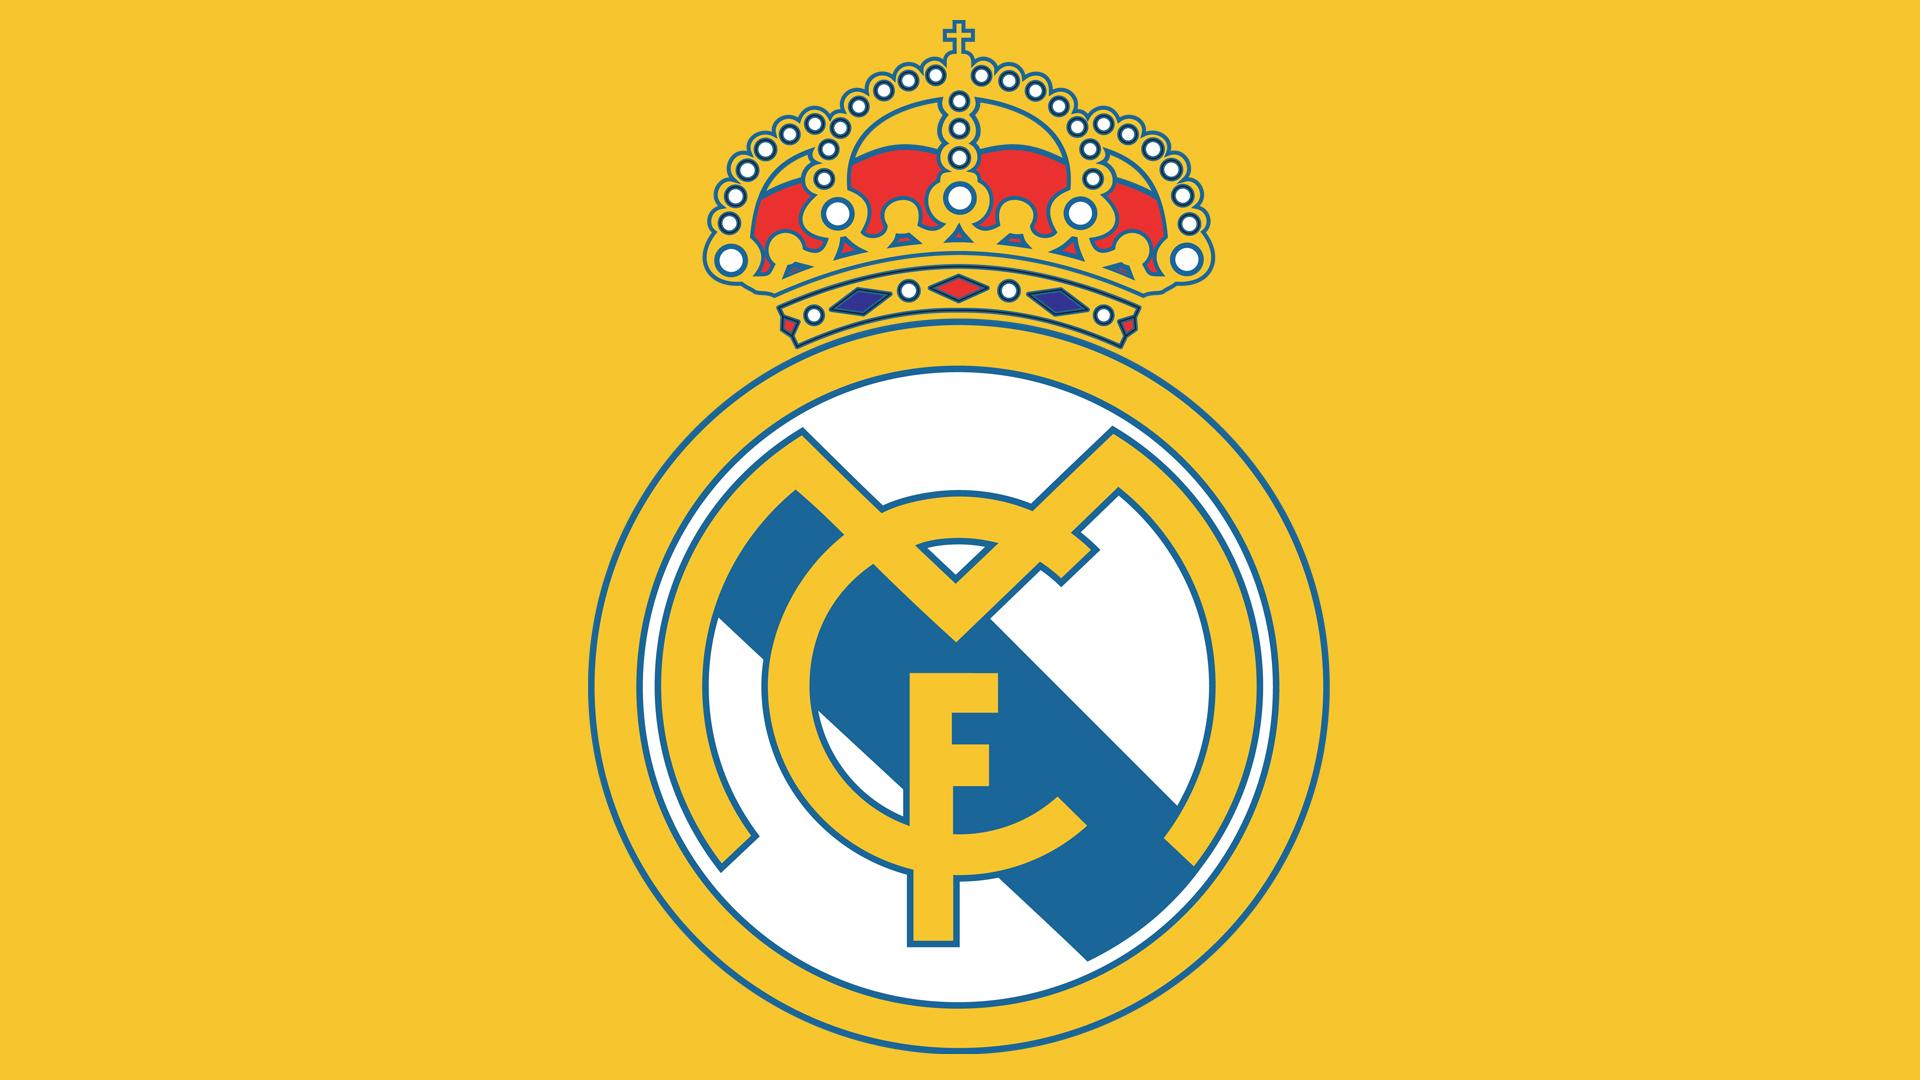 Real madrid logo tous les logos logo real madrid voltagebd Choice Image